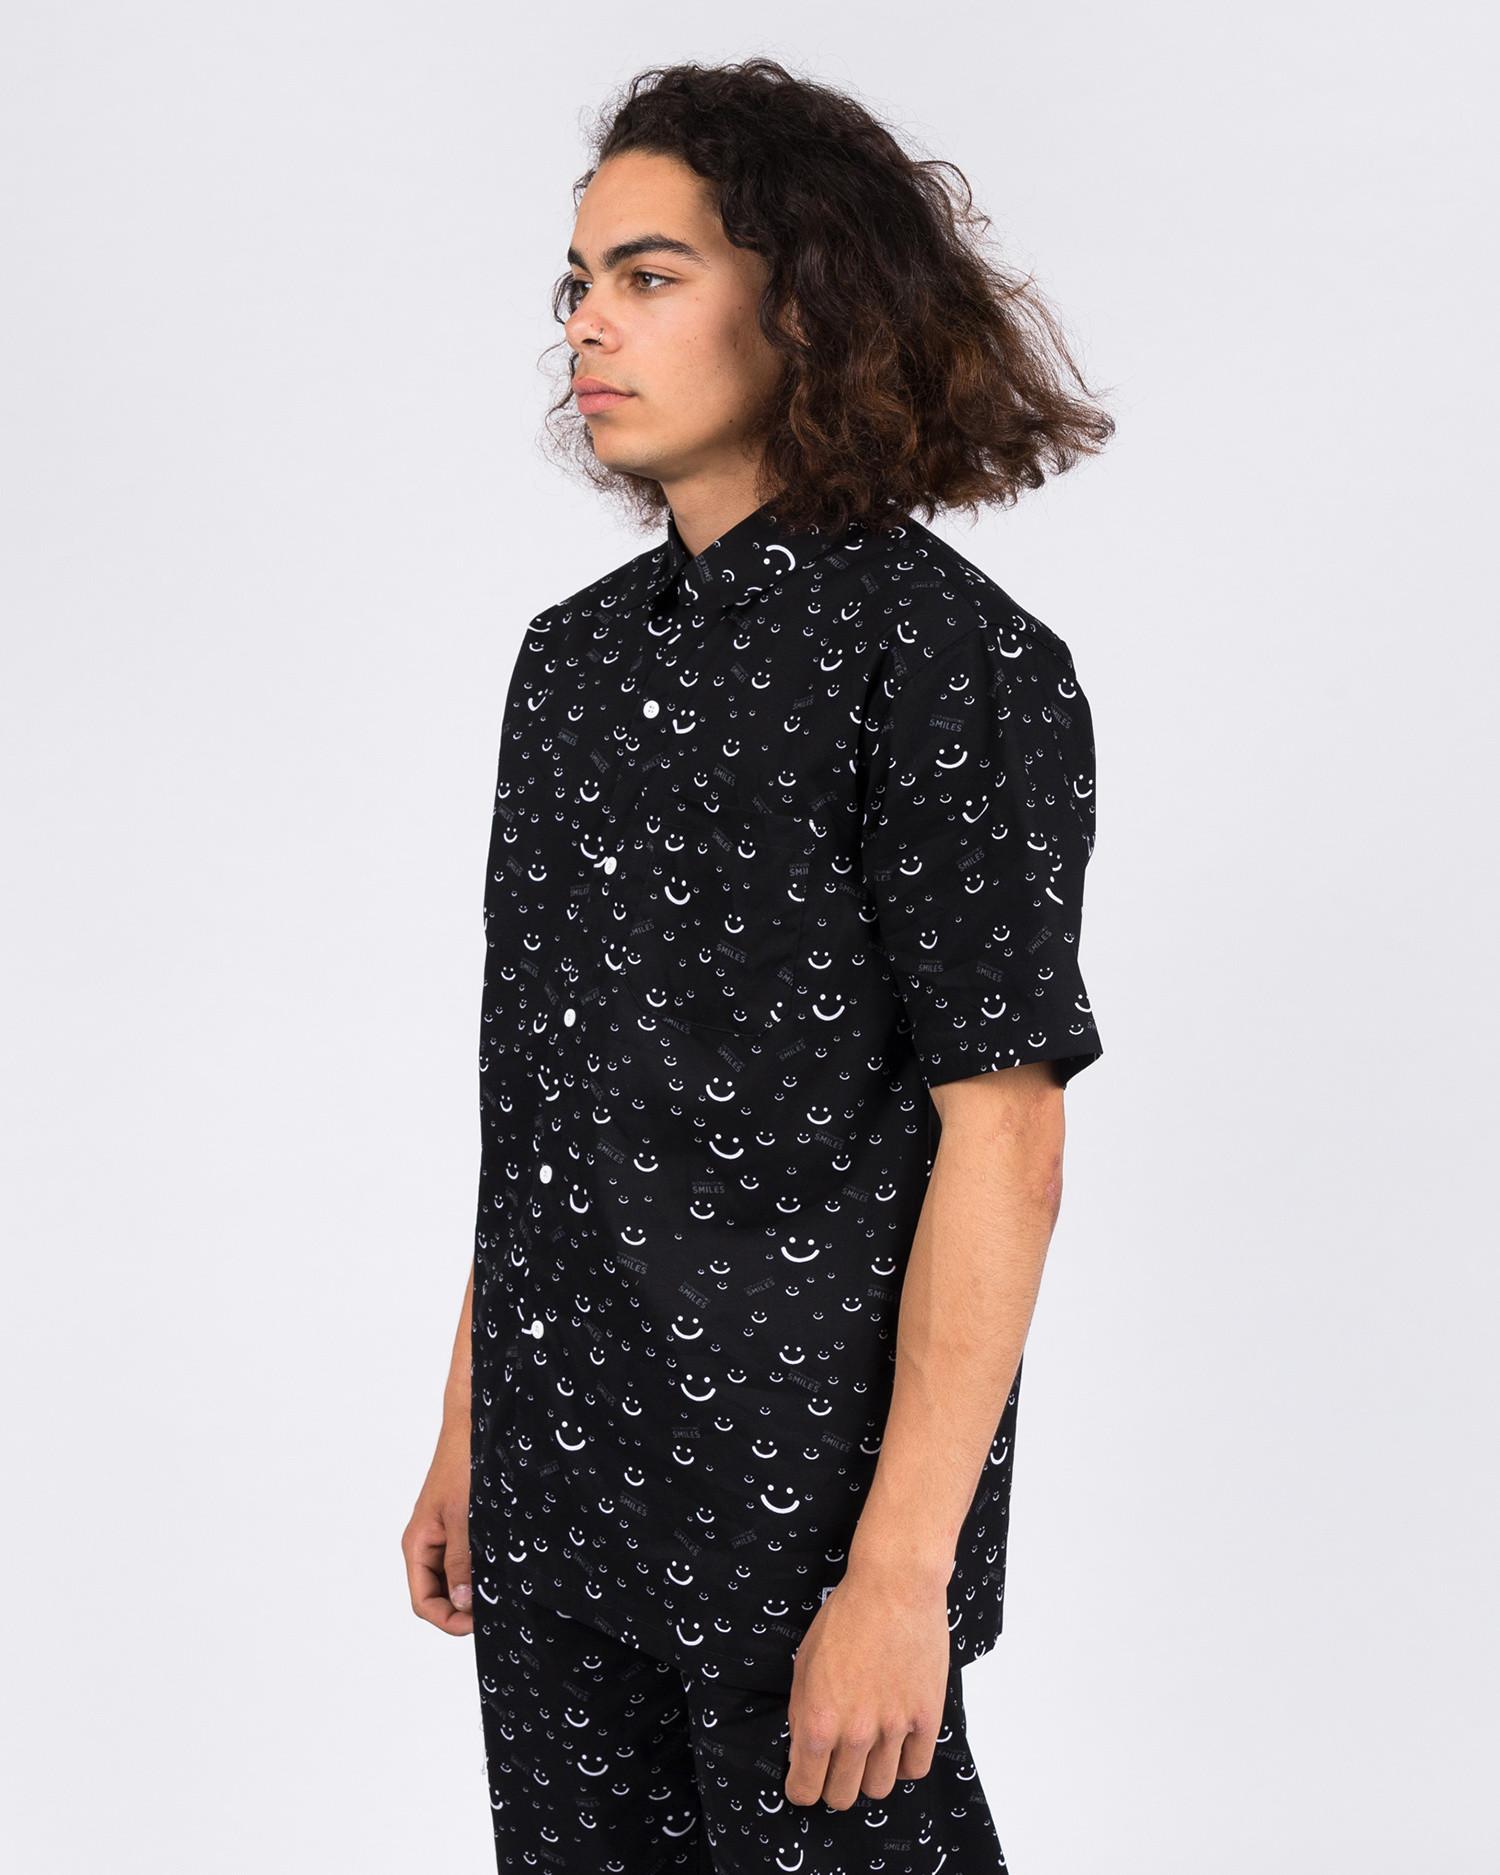 Lousy Livin x Jean Jaques Pyjama Shirt BlacK